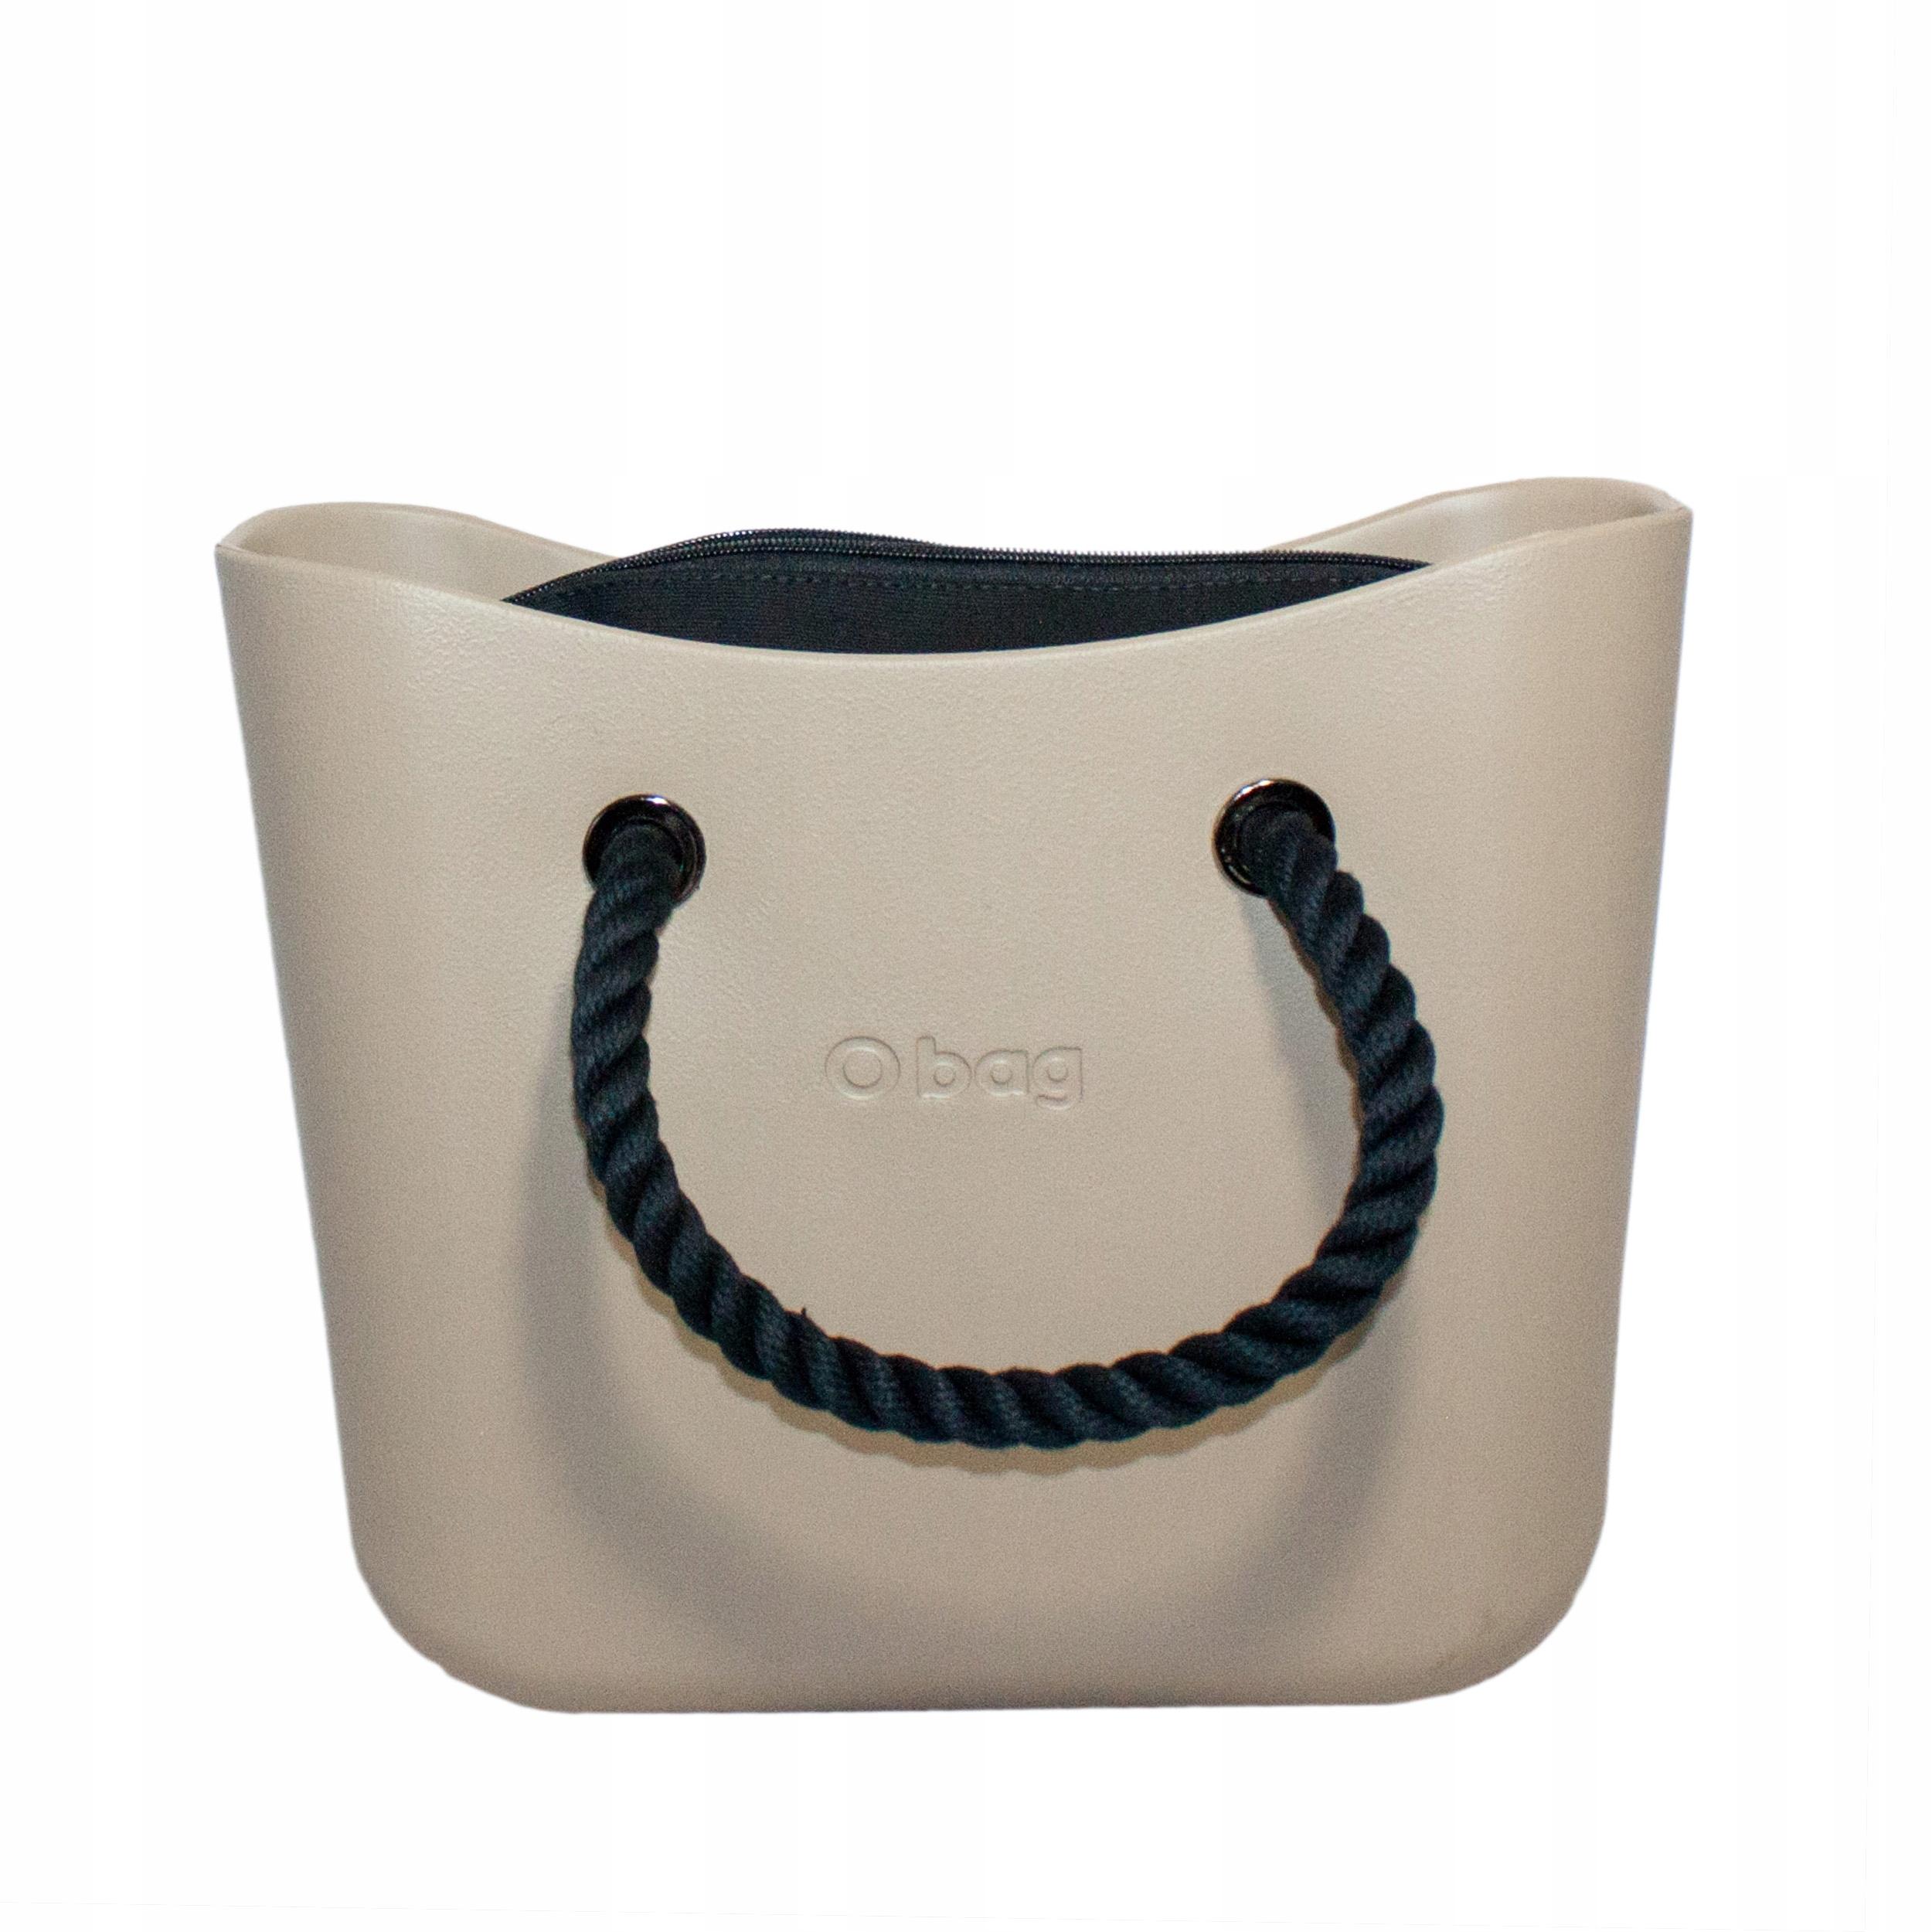 9dfbda131475a Mini O bag body Piaskowa Kr.Czarne Orgr Czarny - 7698434939 ...